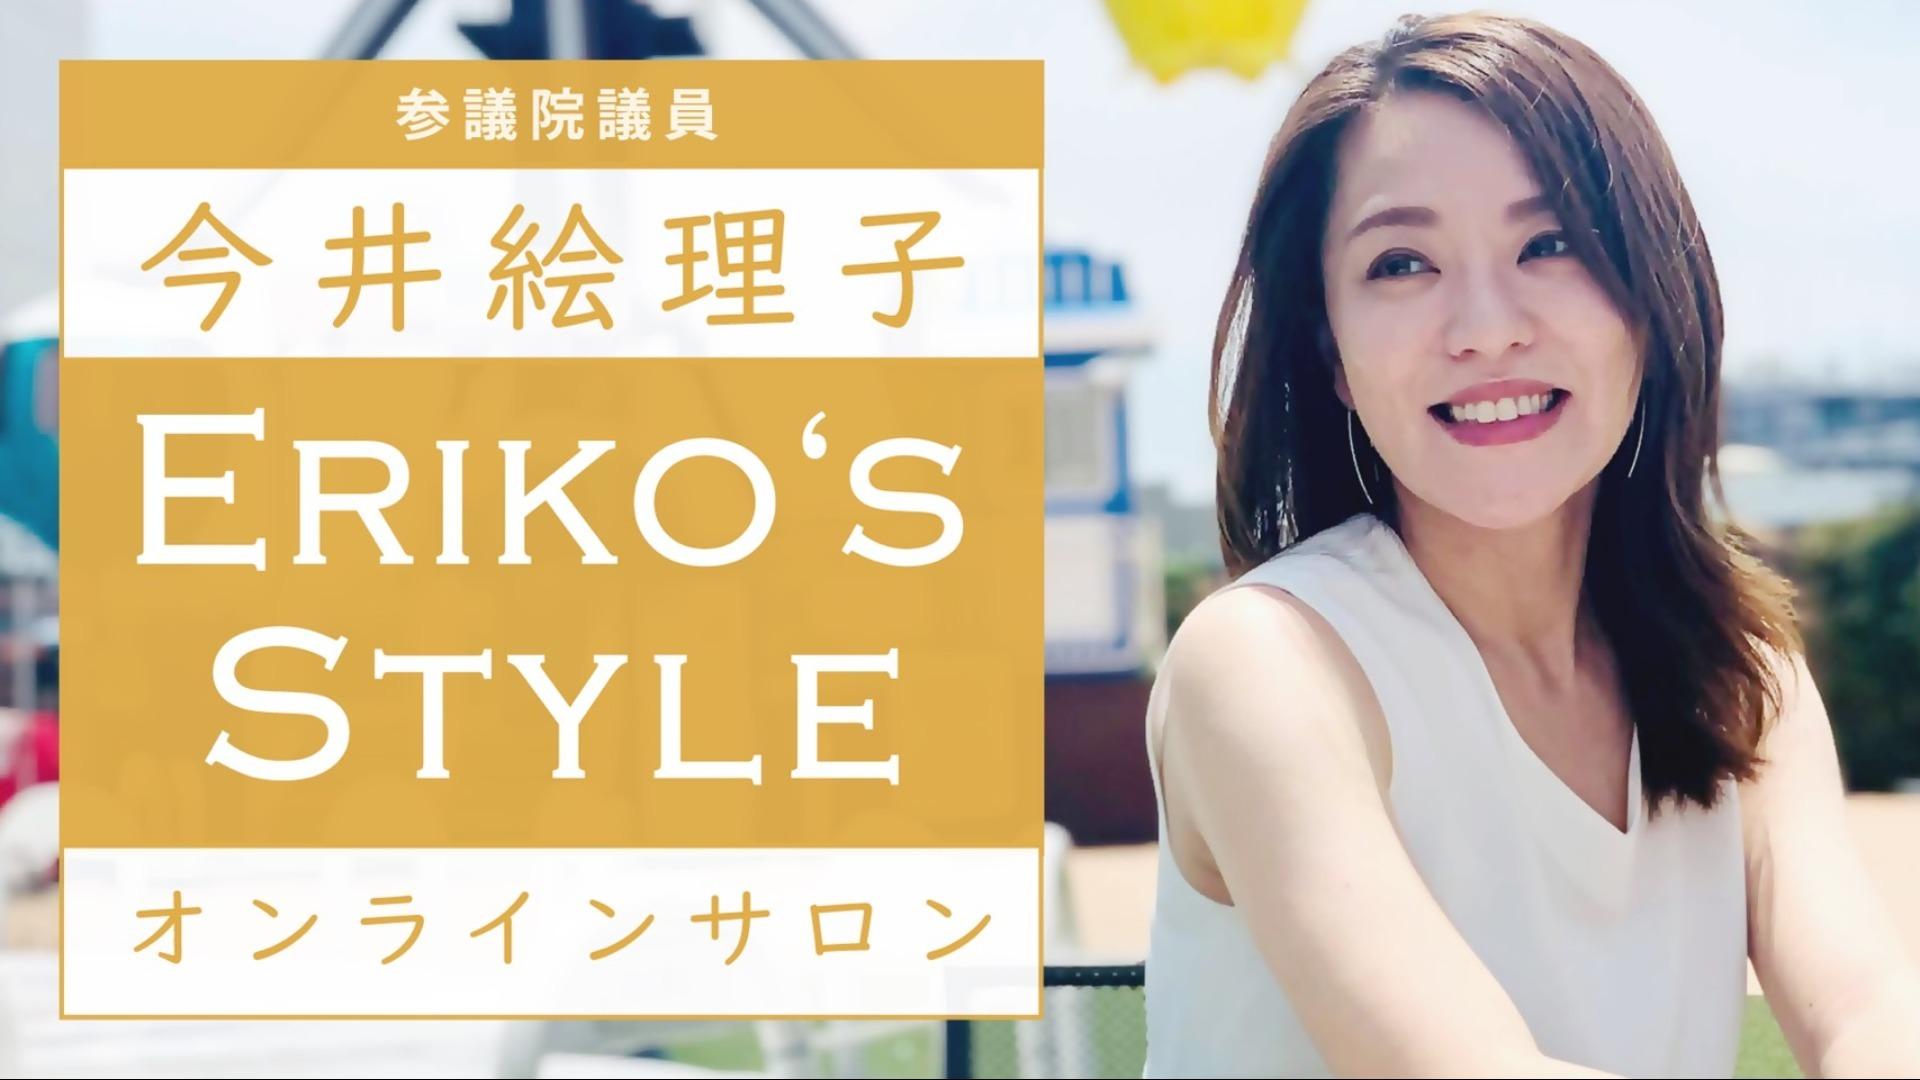 Eriko's Style -今井絵理子の公式オンラインサロン‐